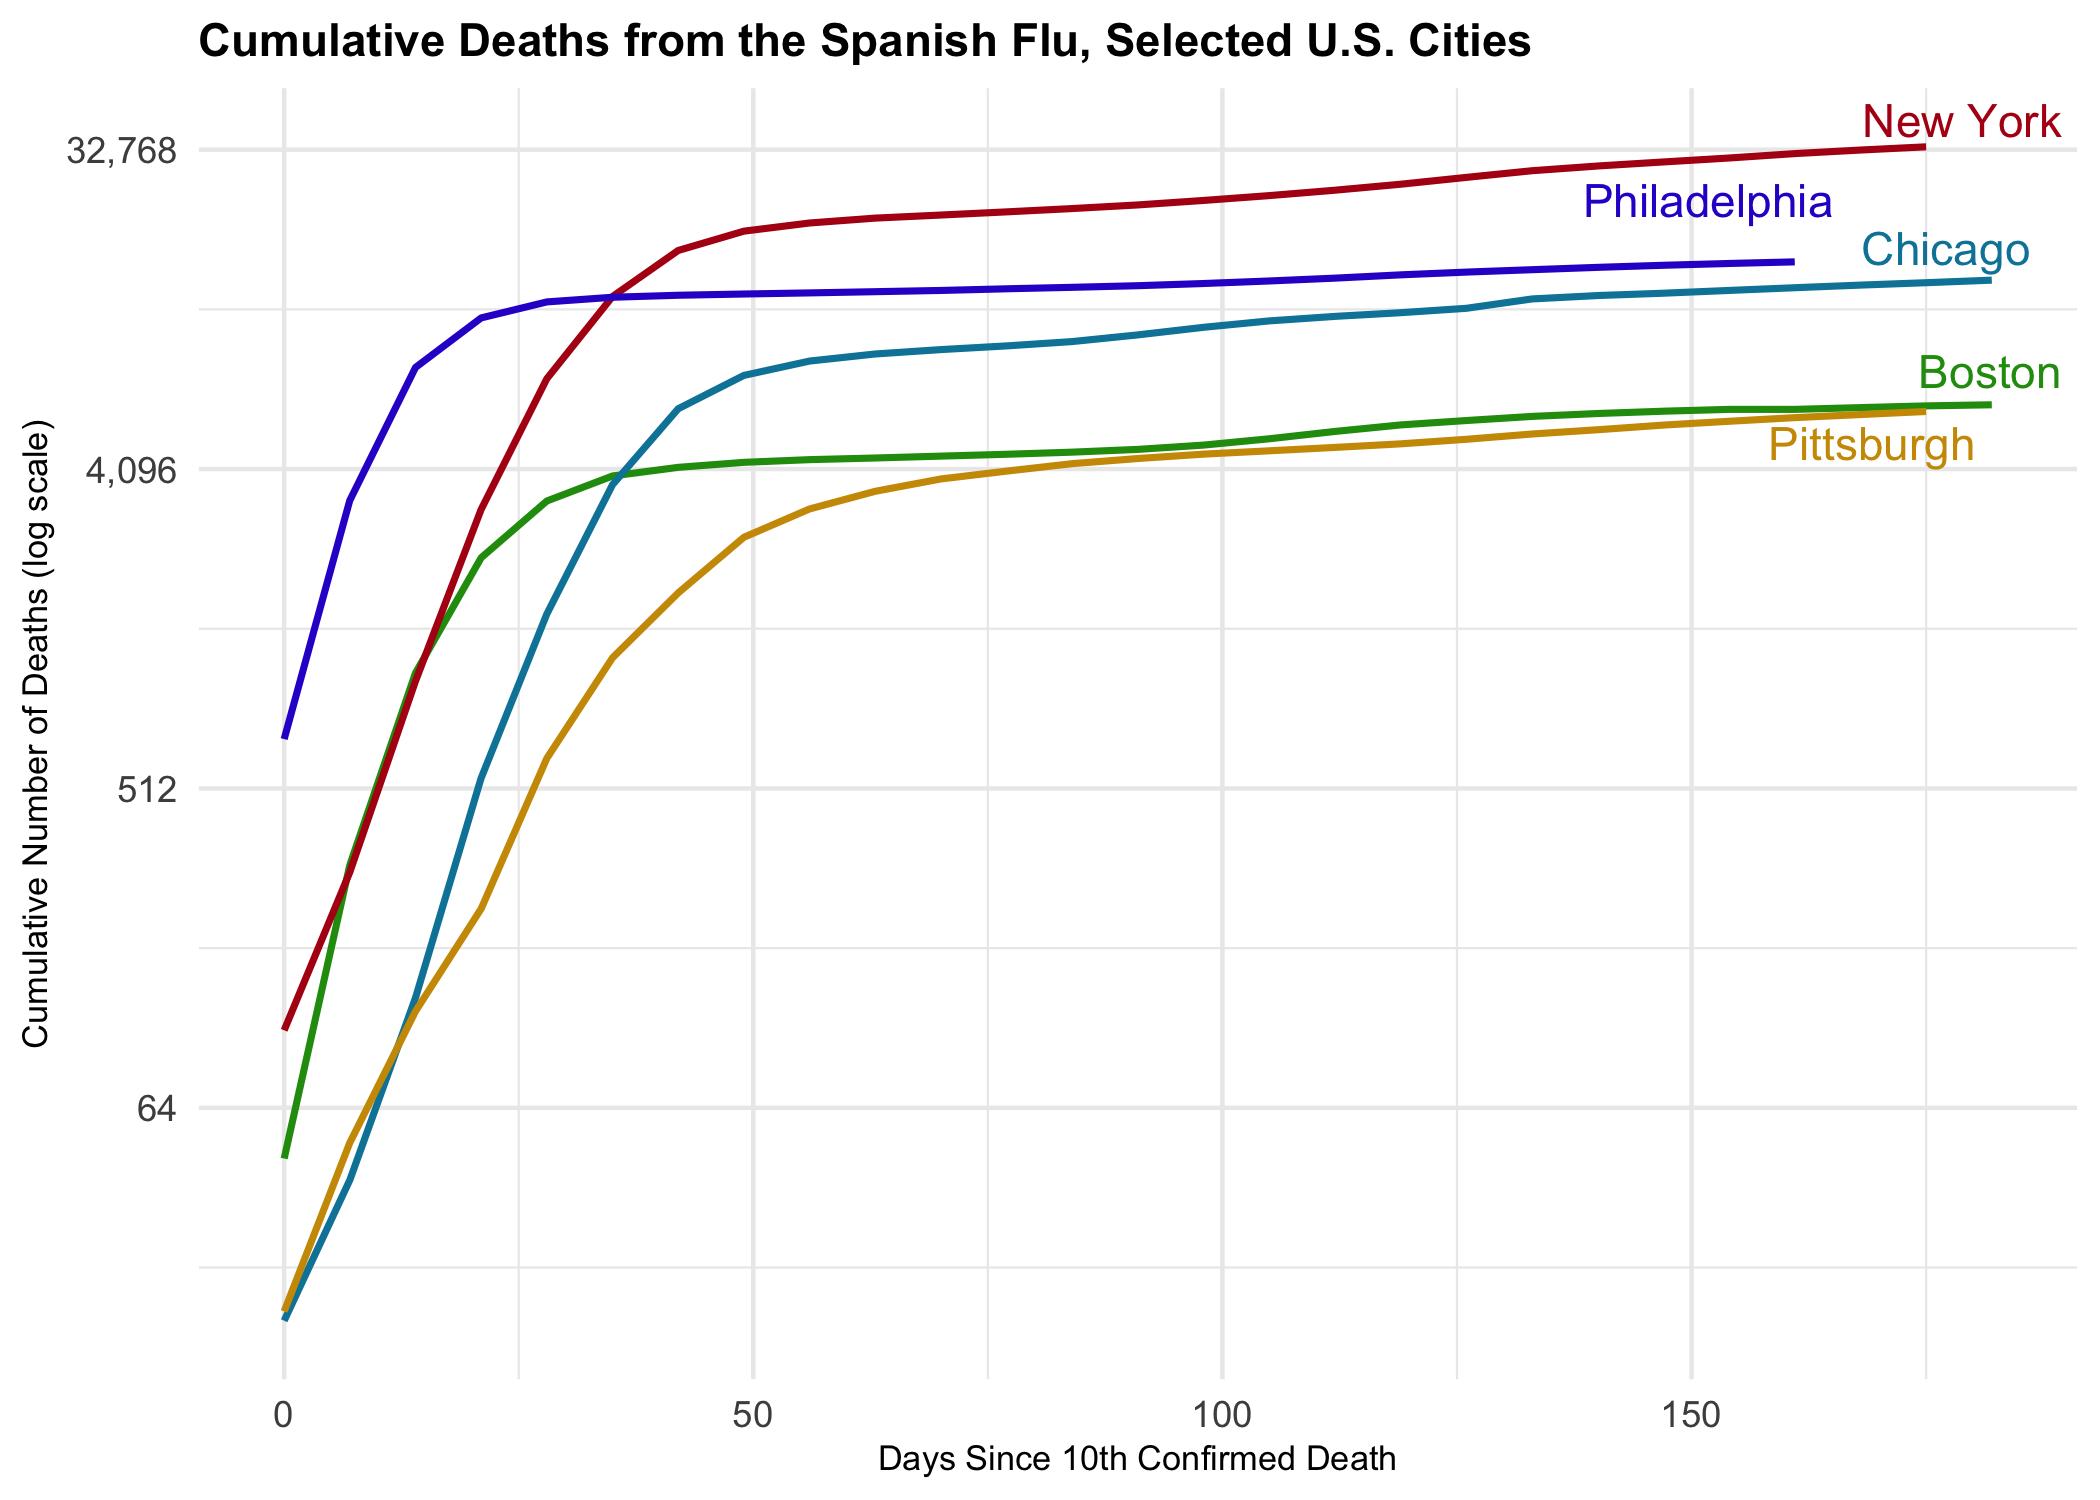 Cummulative Deaths from the Spanish Flu